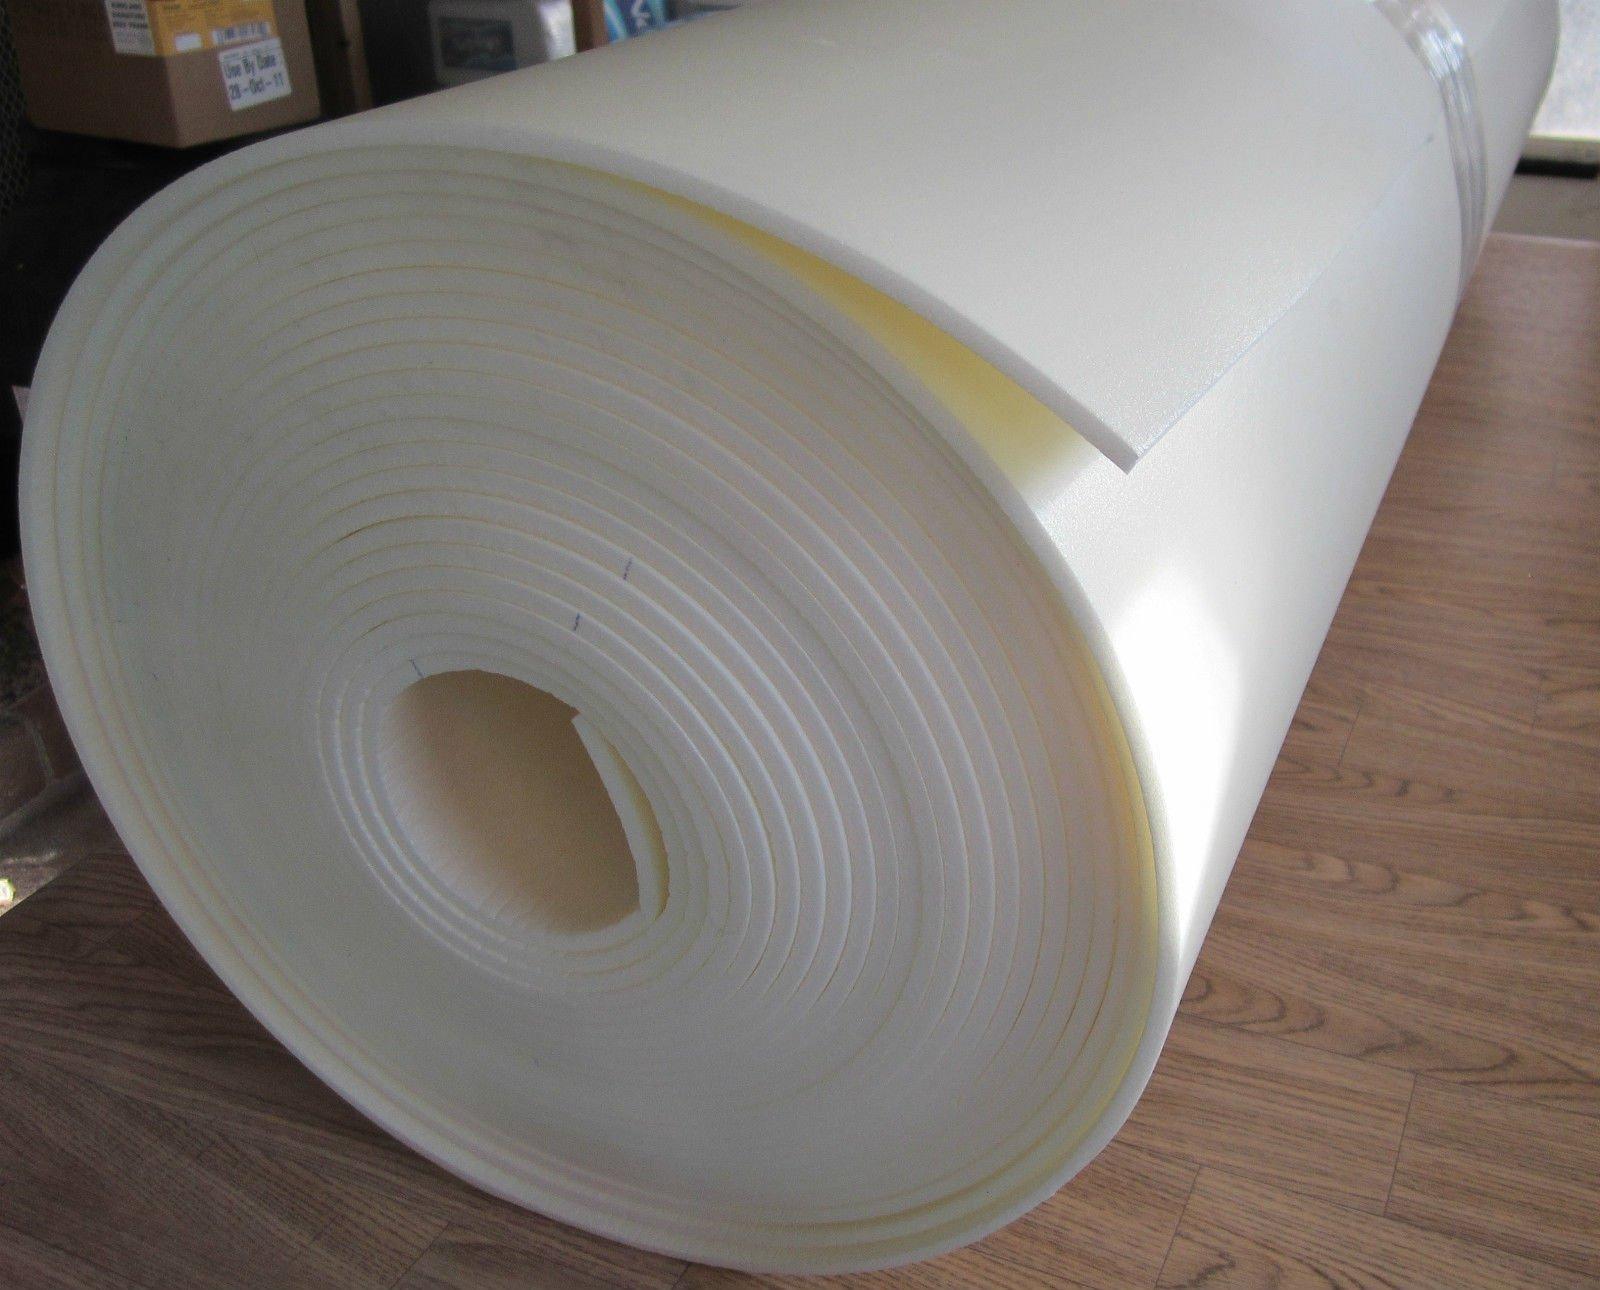 Craft Foam Hi dense Closed Cell Upholstery Auto Interior Poker 1//4x 15x 60